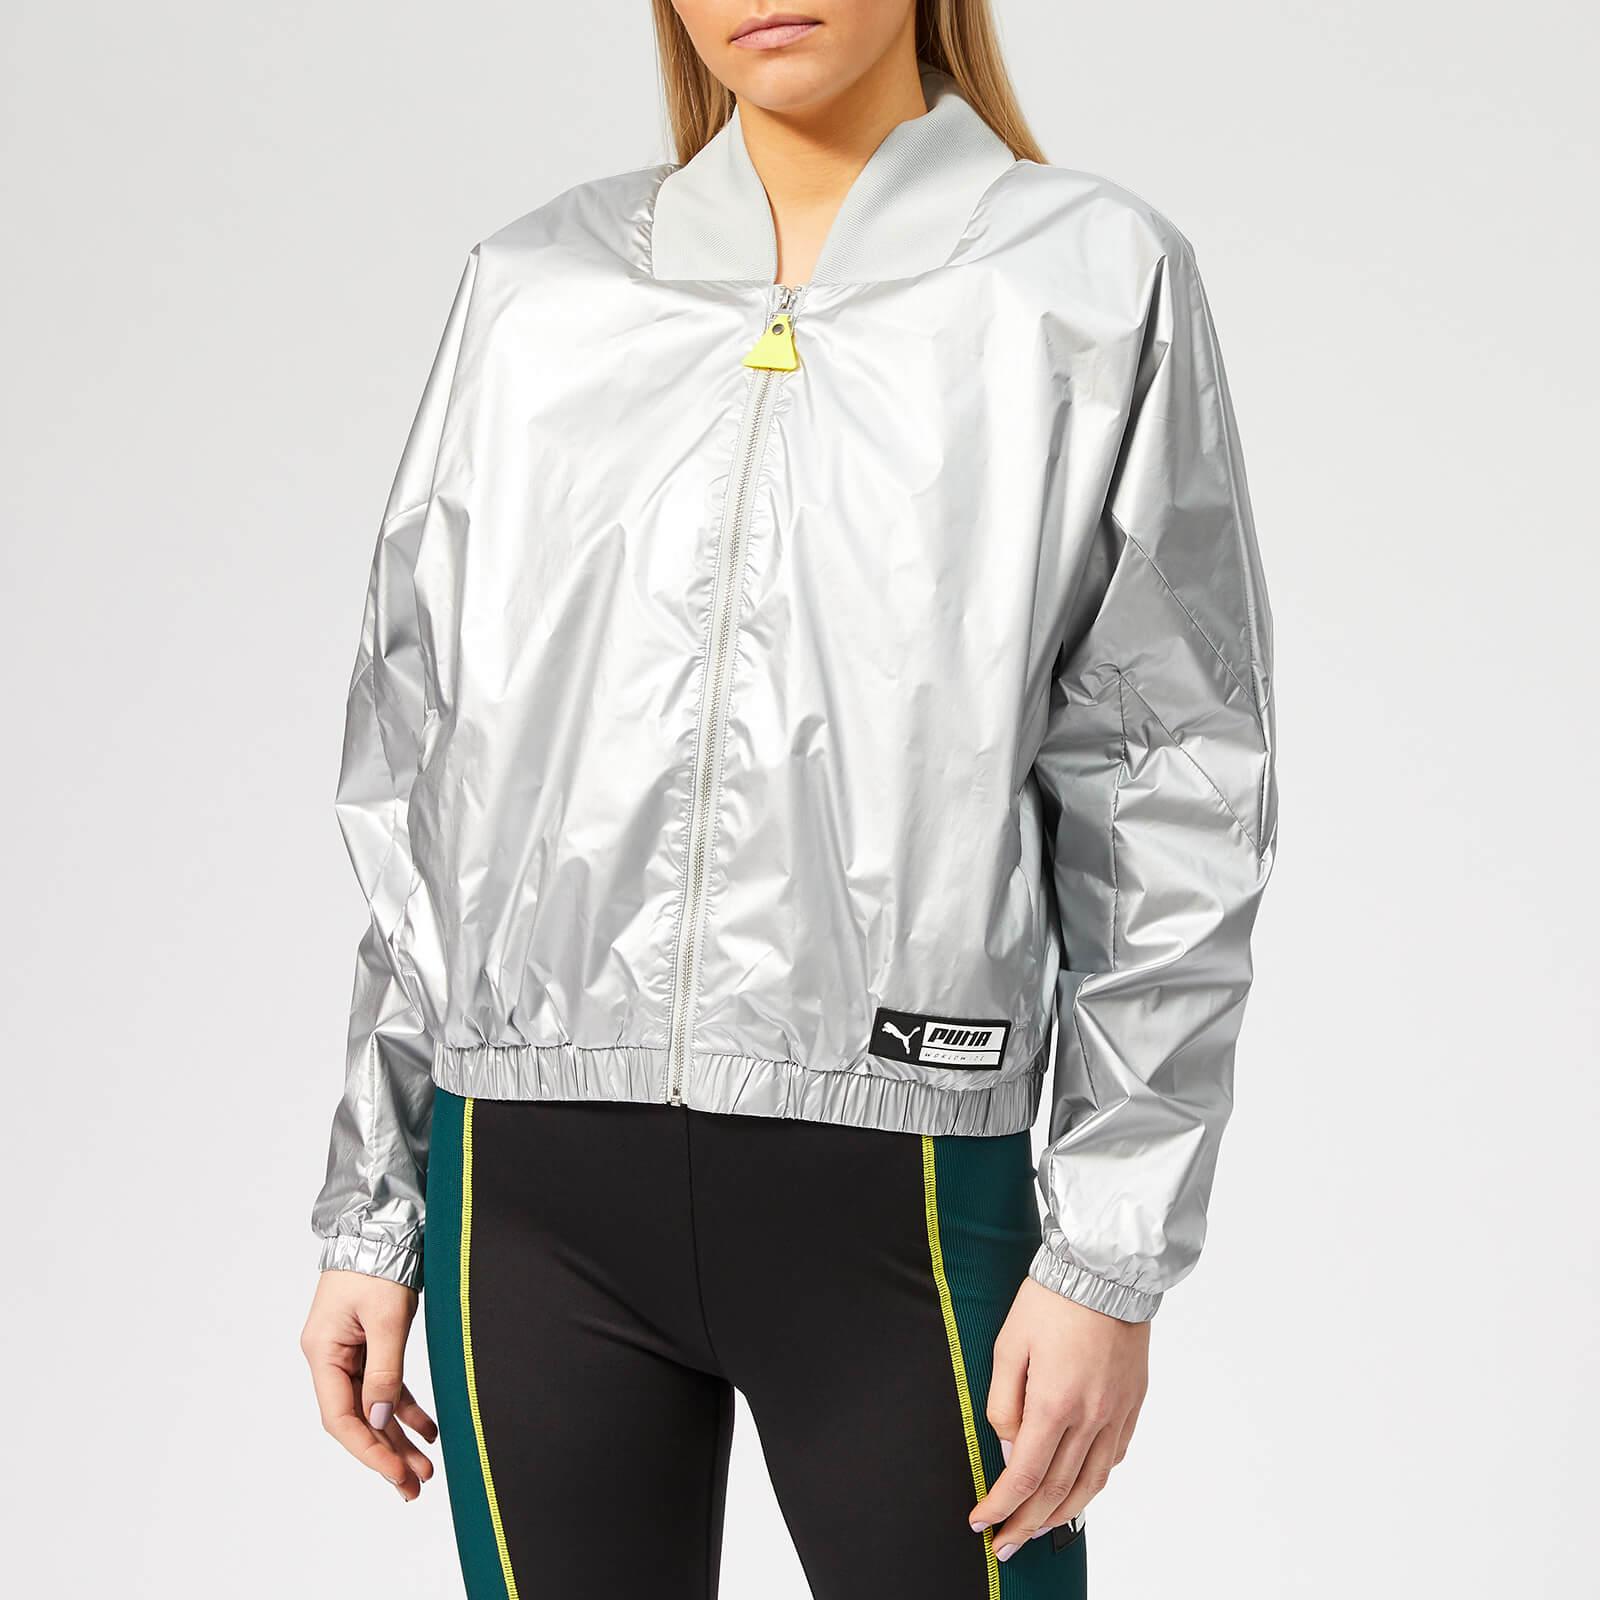 Puma Women's TZ Jacket - Puma White - M - Silver